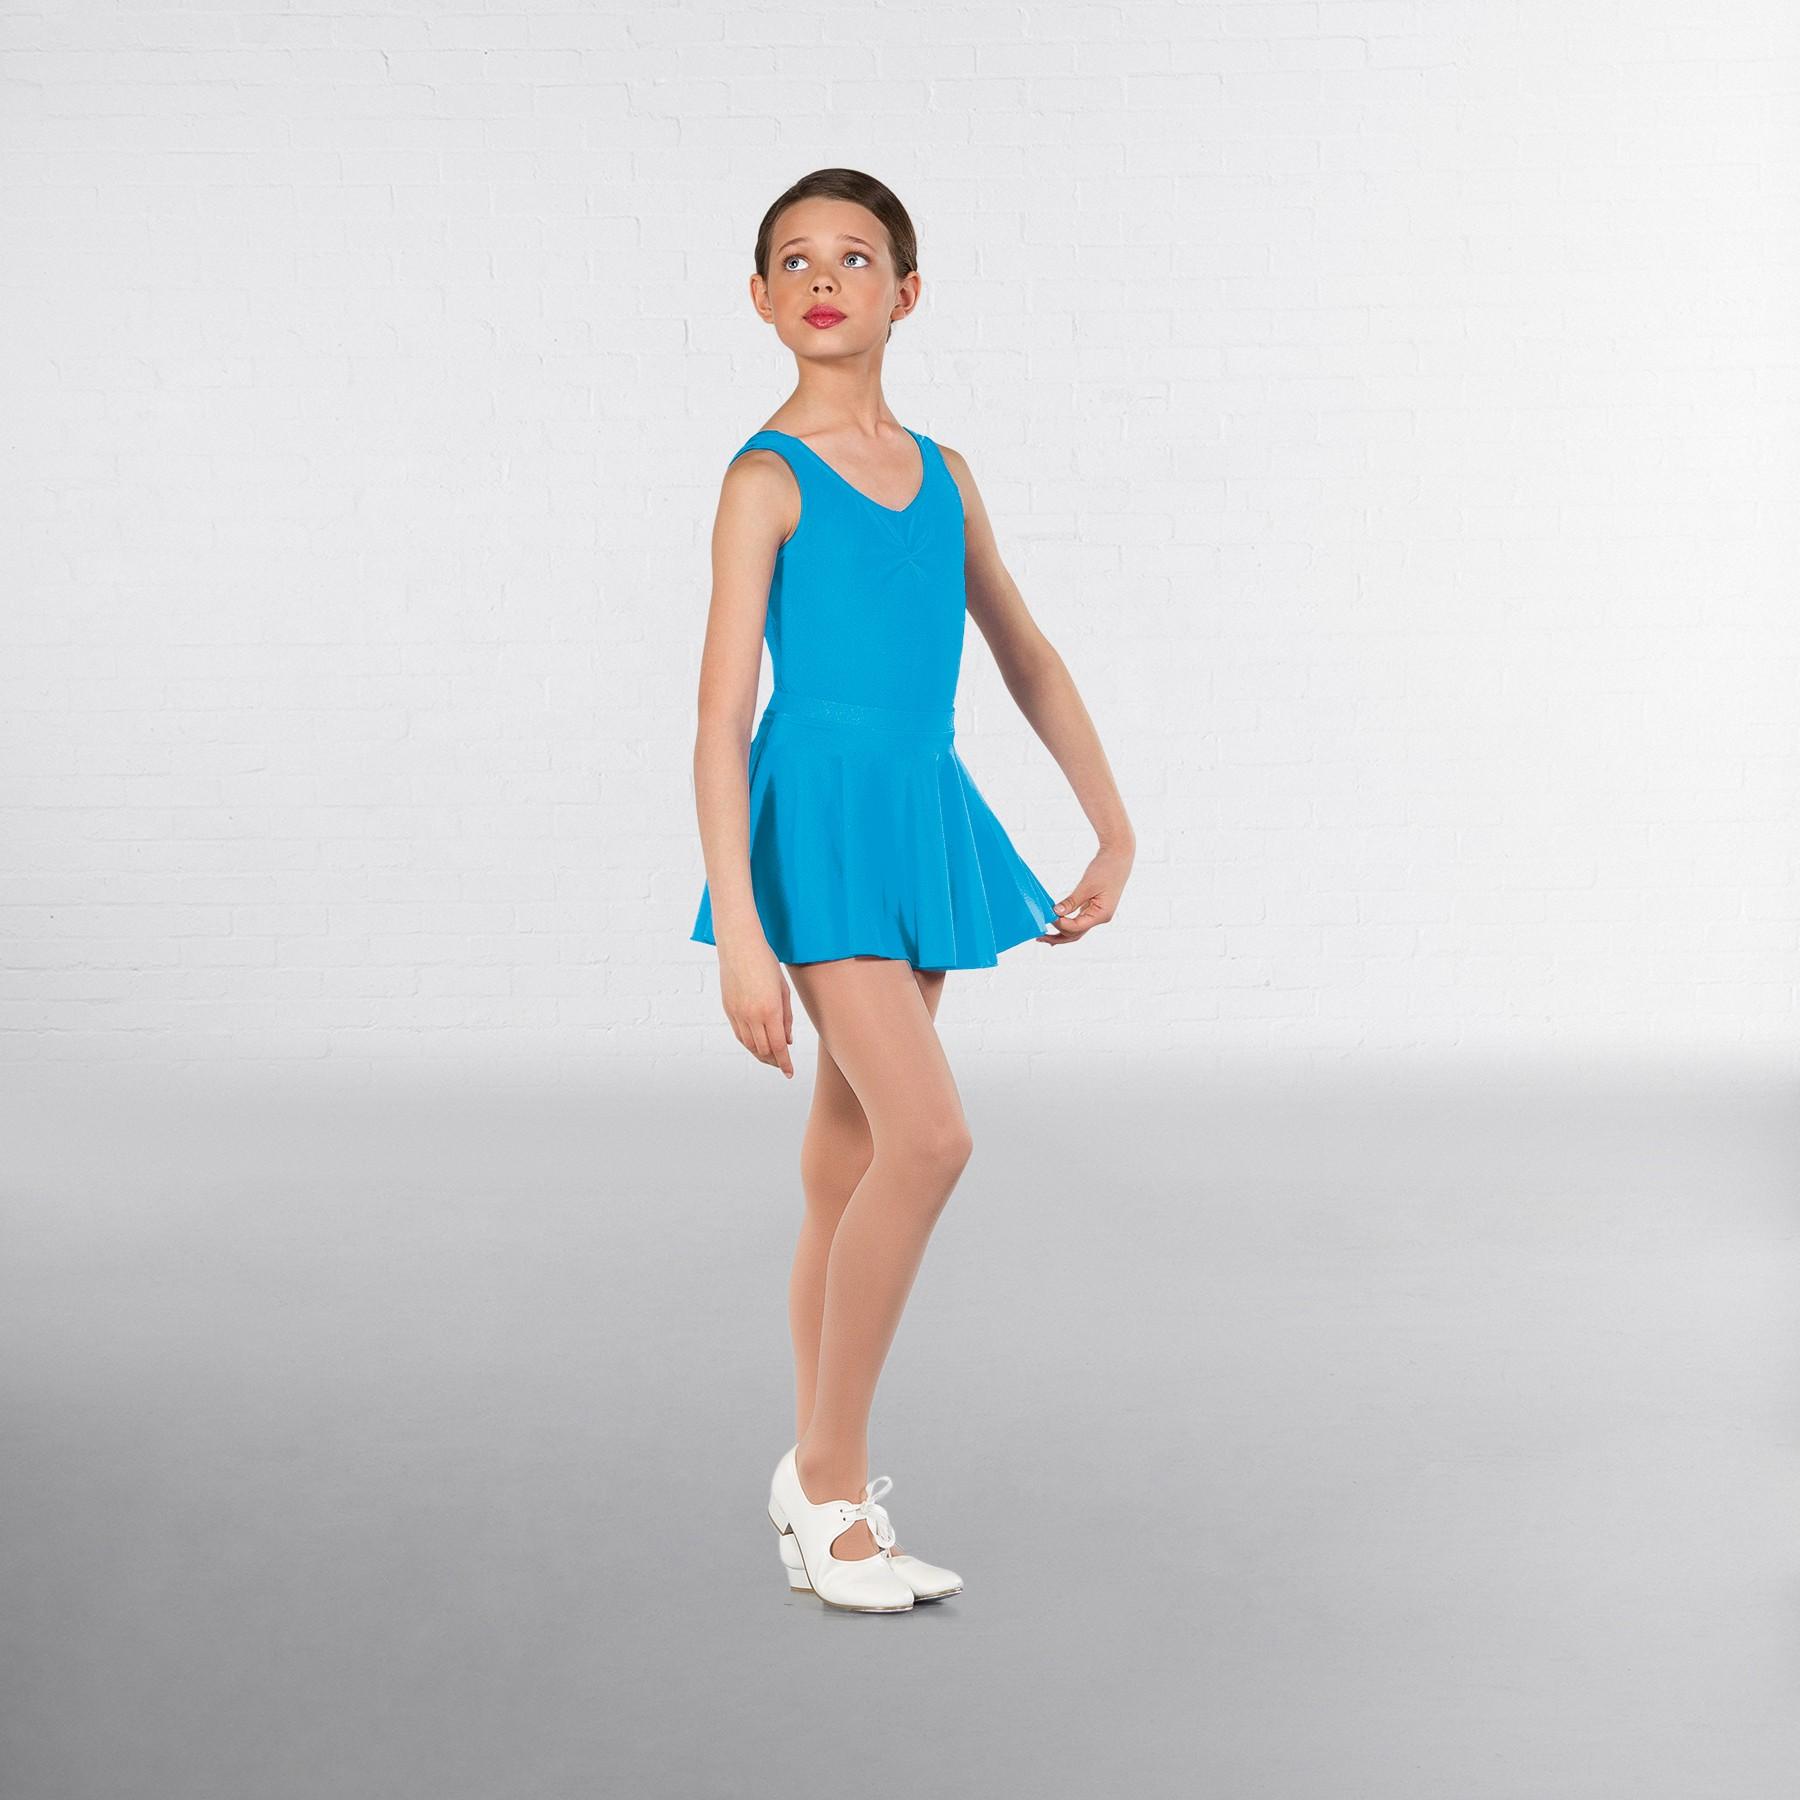 1st Position Circular Skirt (Kingfisher)